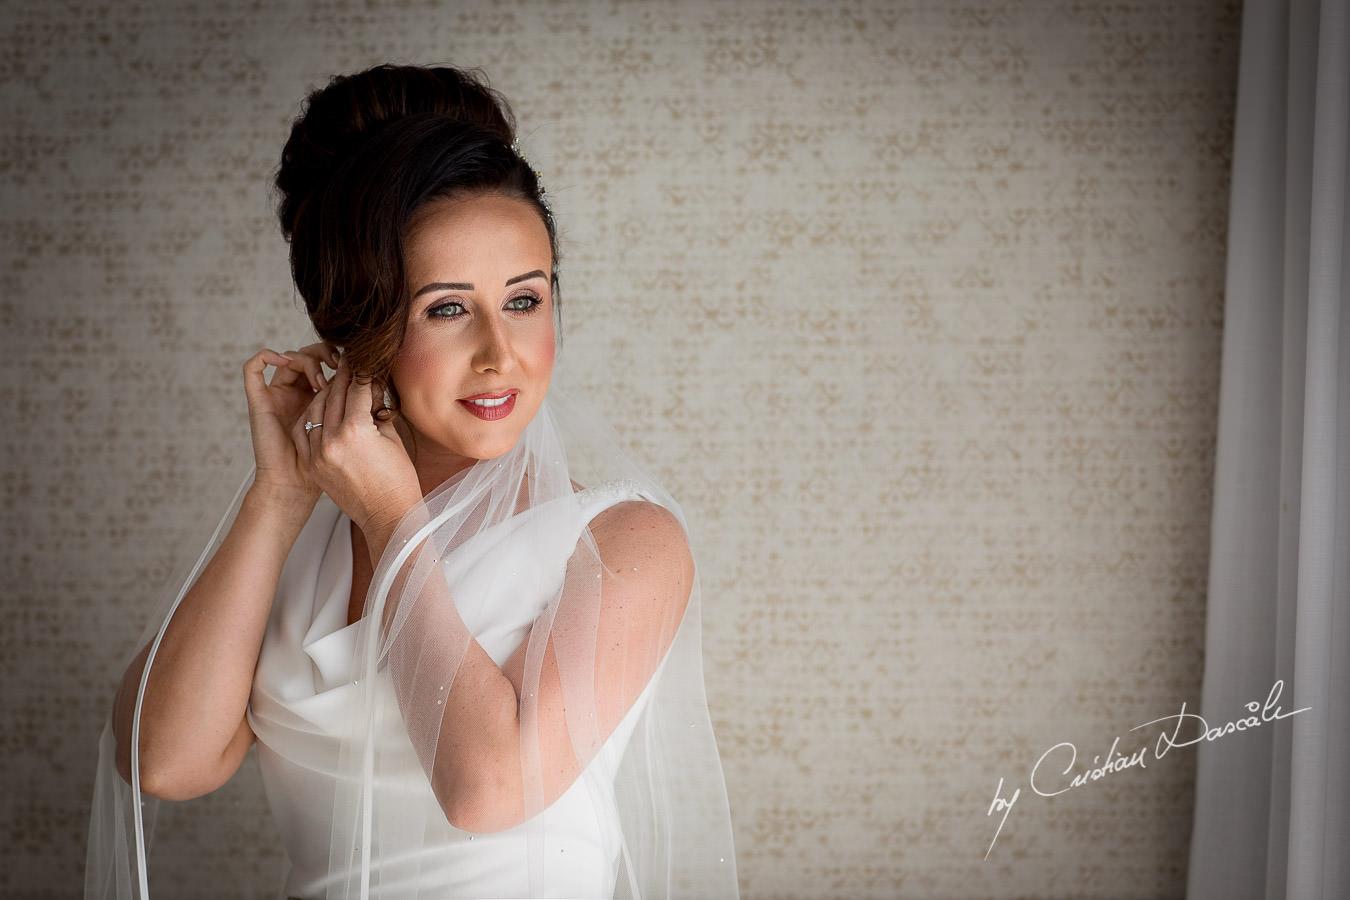 Stunning bridal portrait captured by Cristian Dascalu during an elegant Aphrodite Hills Wedding in Cyprus.